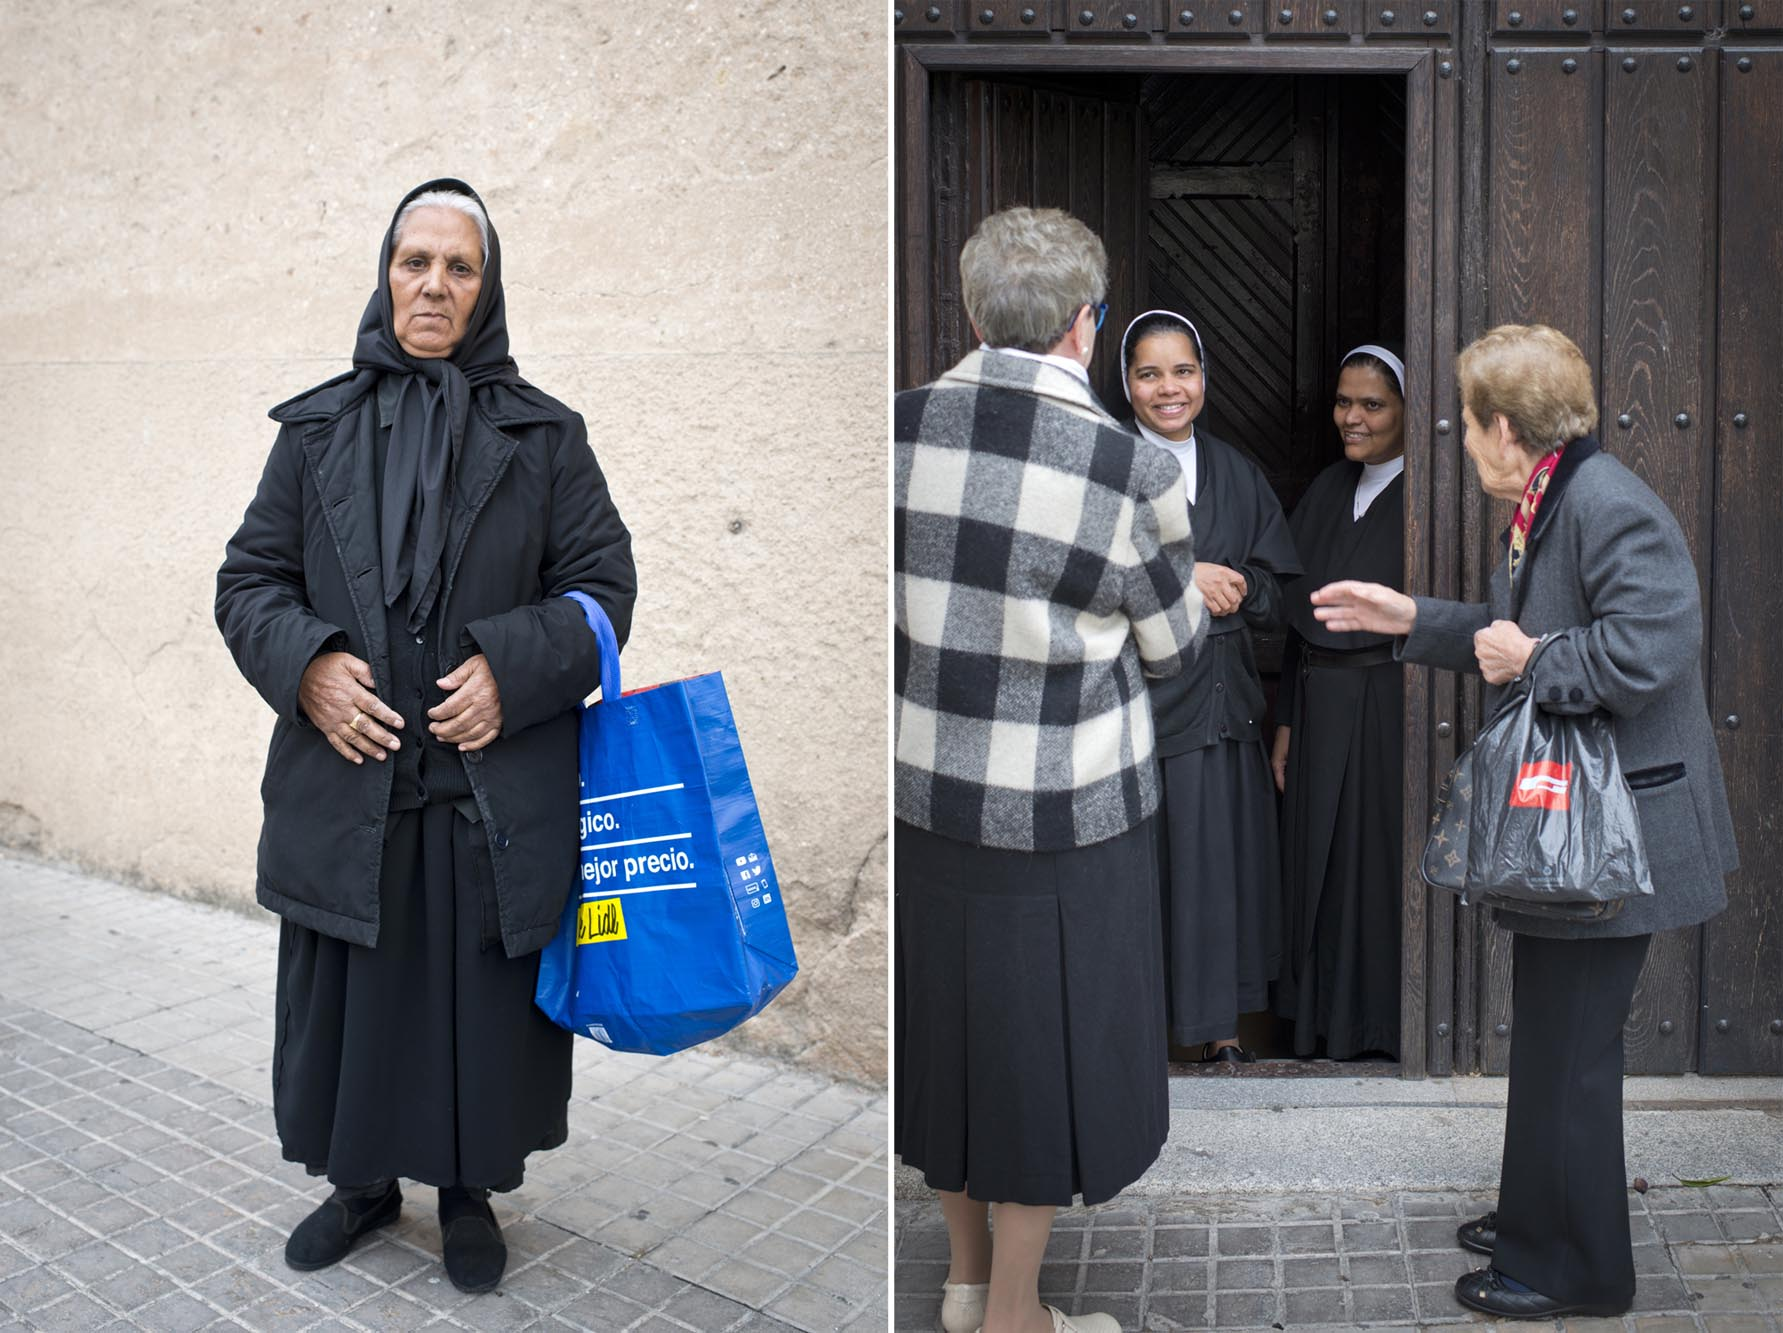 Teresa Jiménez y las Carmelitas. Siglo XXI.